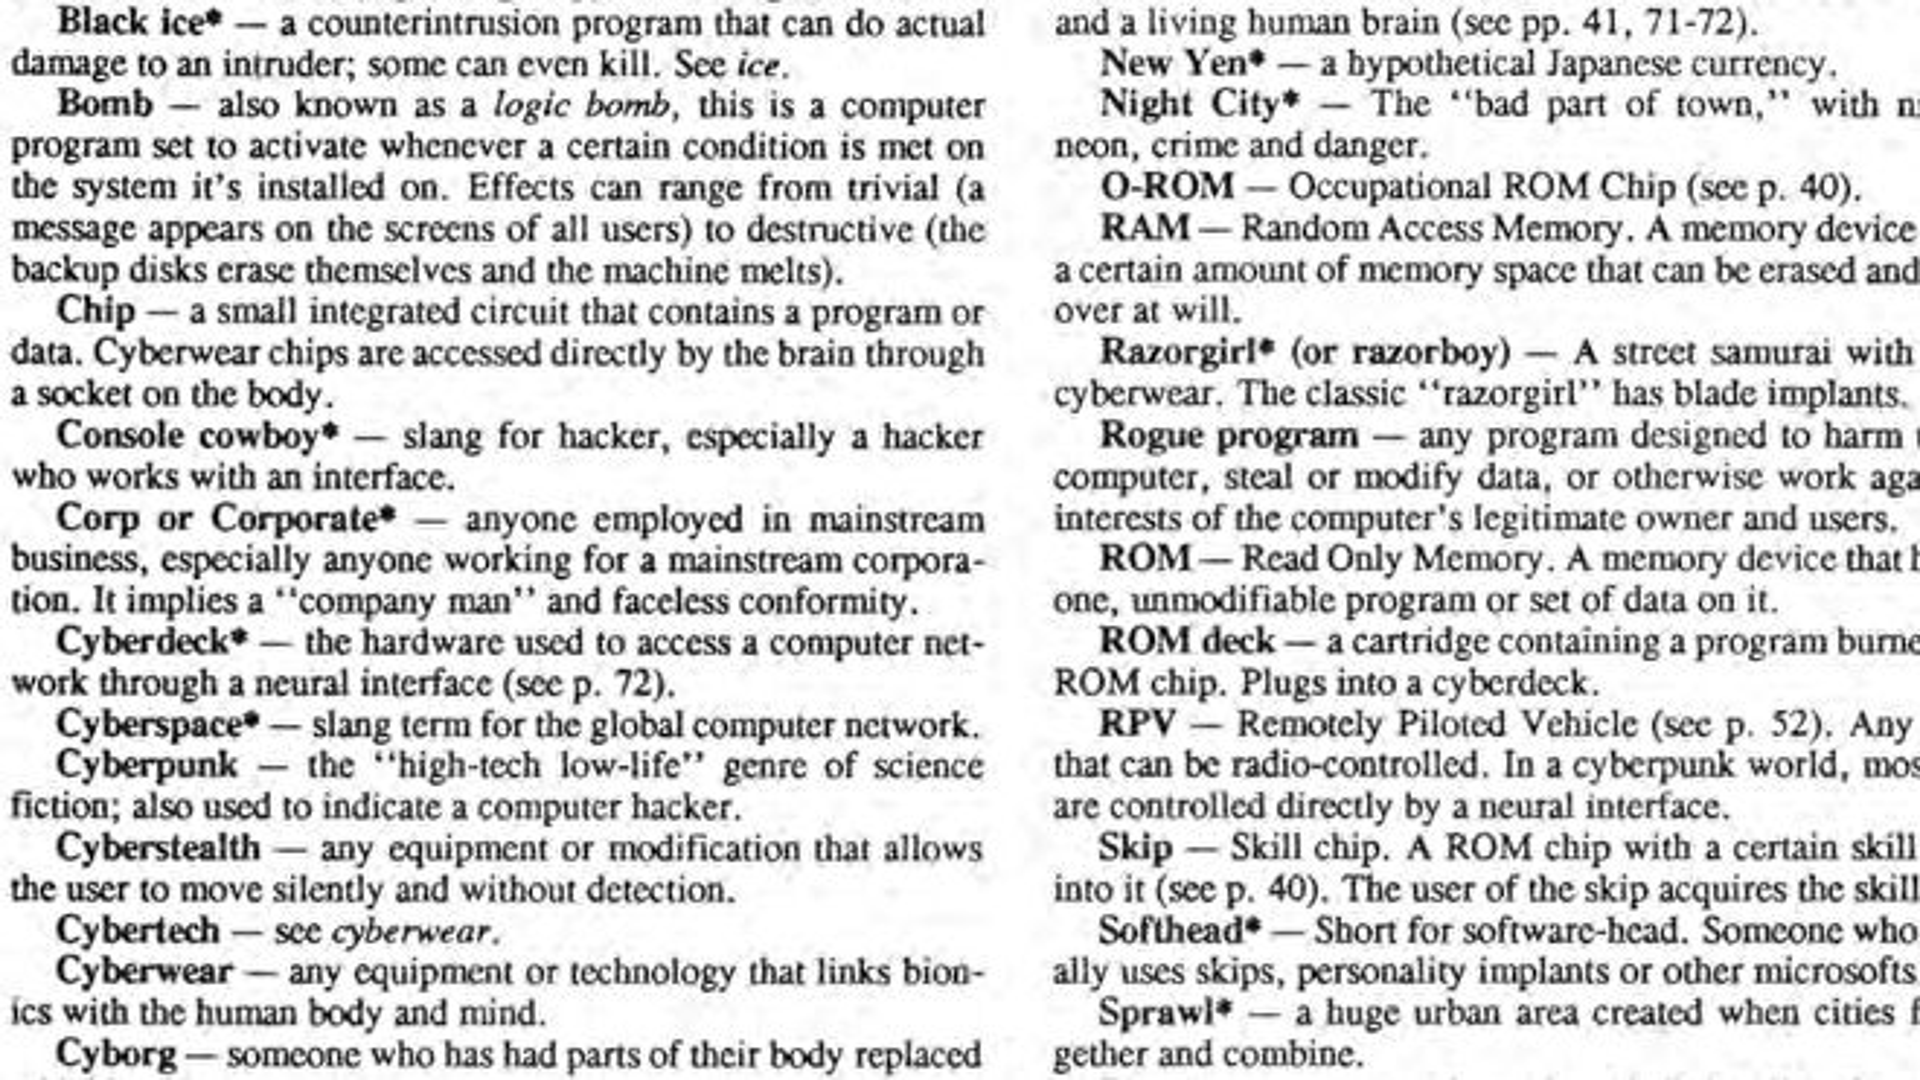 gurps-cyberpunk-rpg-glossary.png